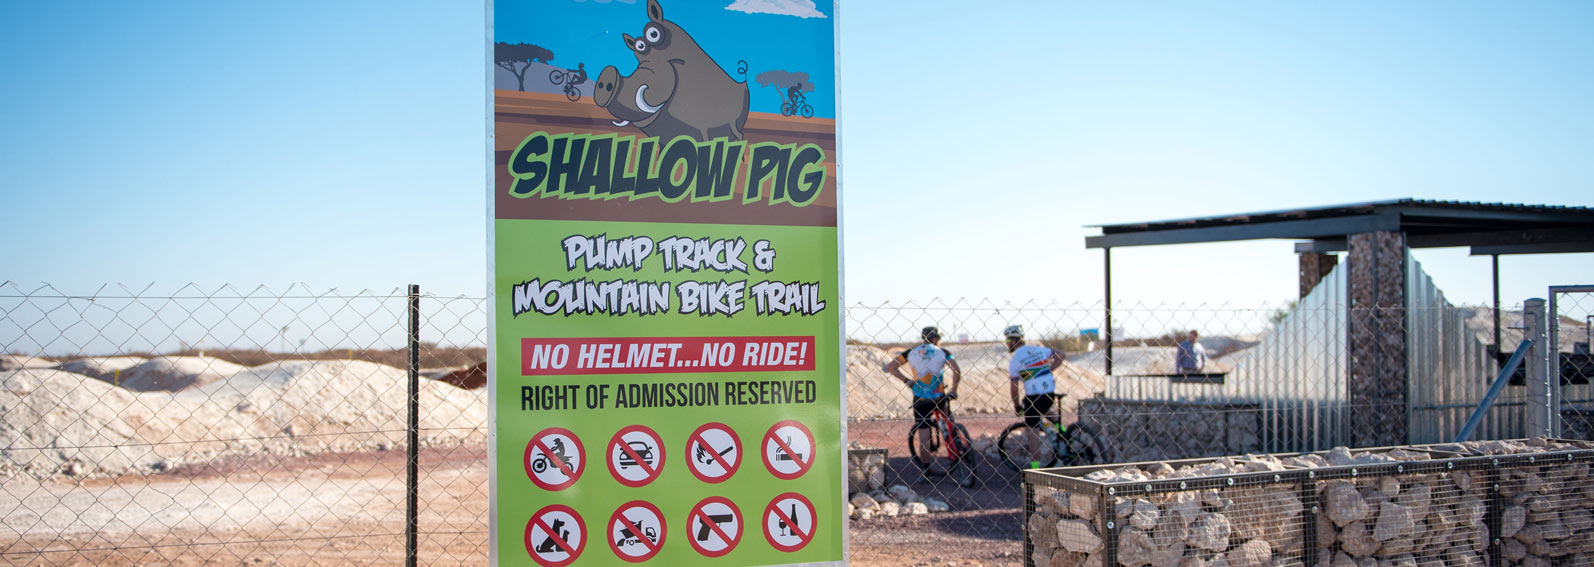 Shallow Pig Pump Track & Bike Trail